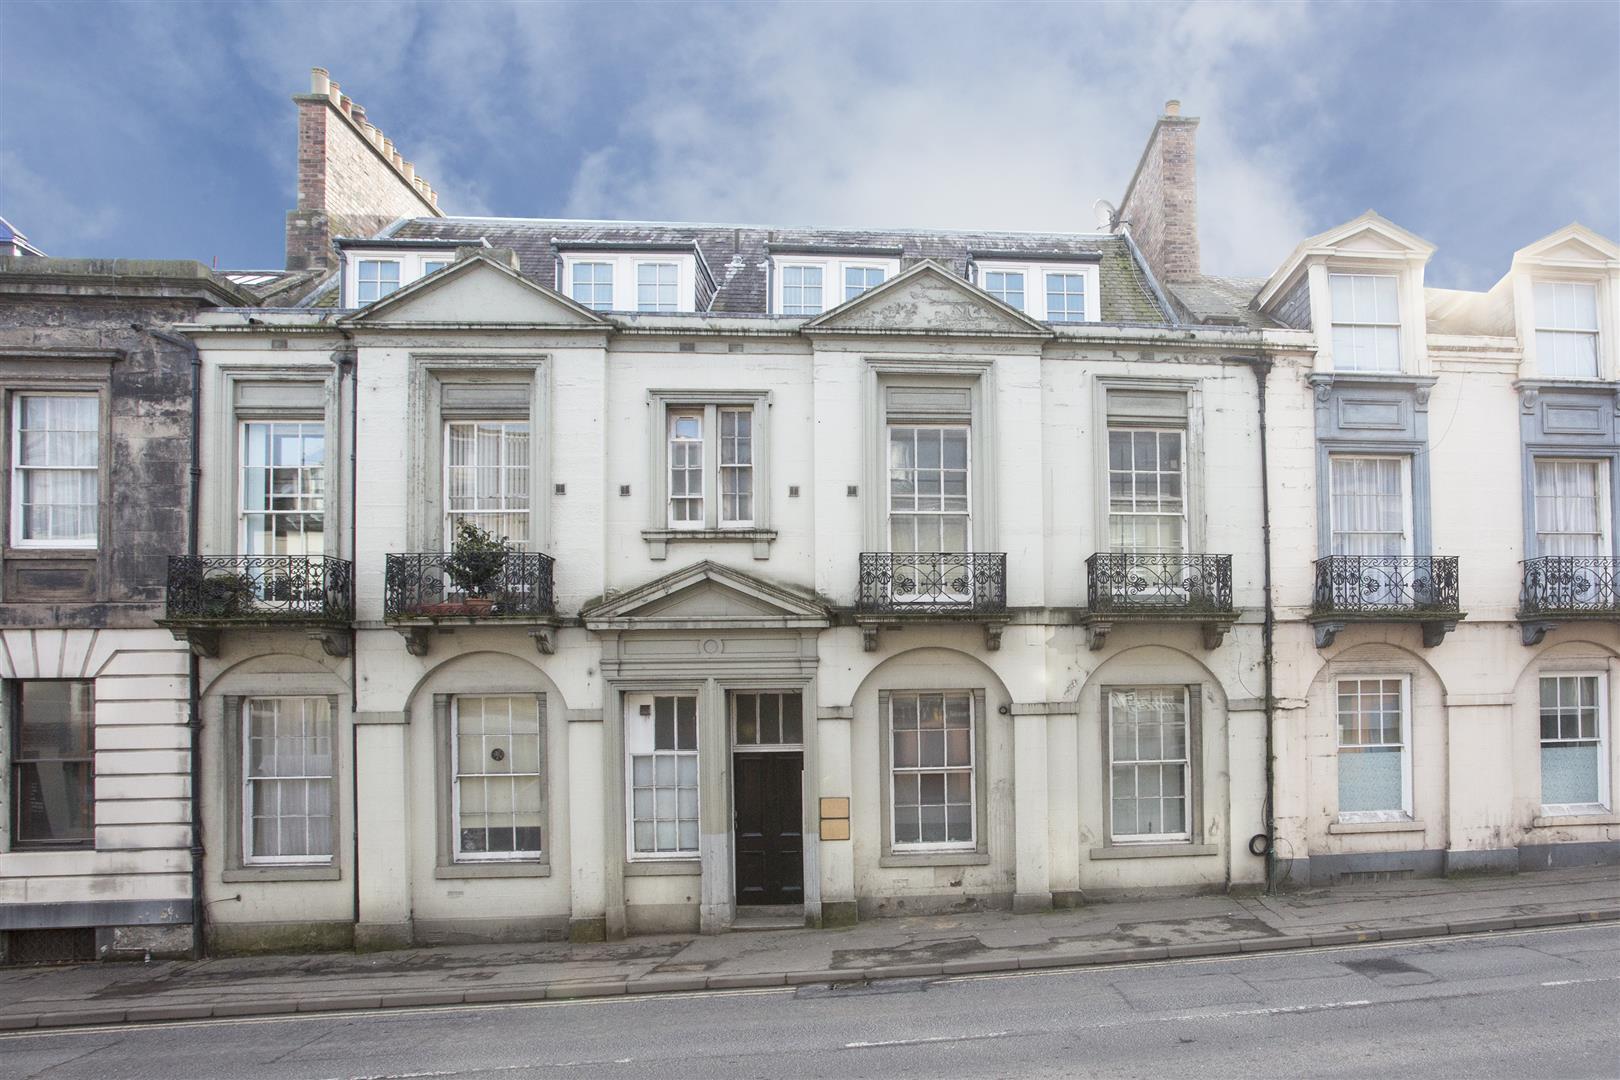 Flat 8H, Stormont House 11-13, Atholl Street, Perth, Perthshire, PH1 5NH, UK